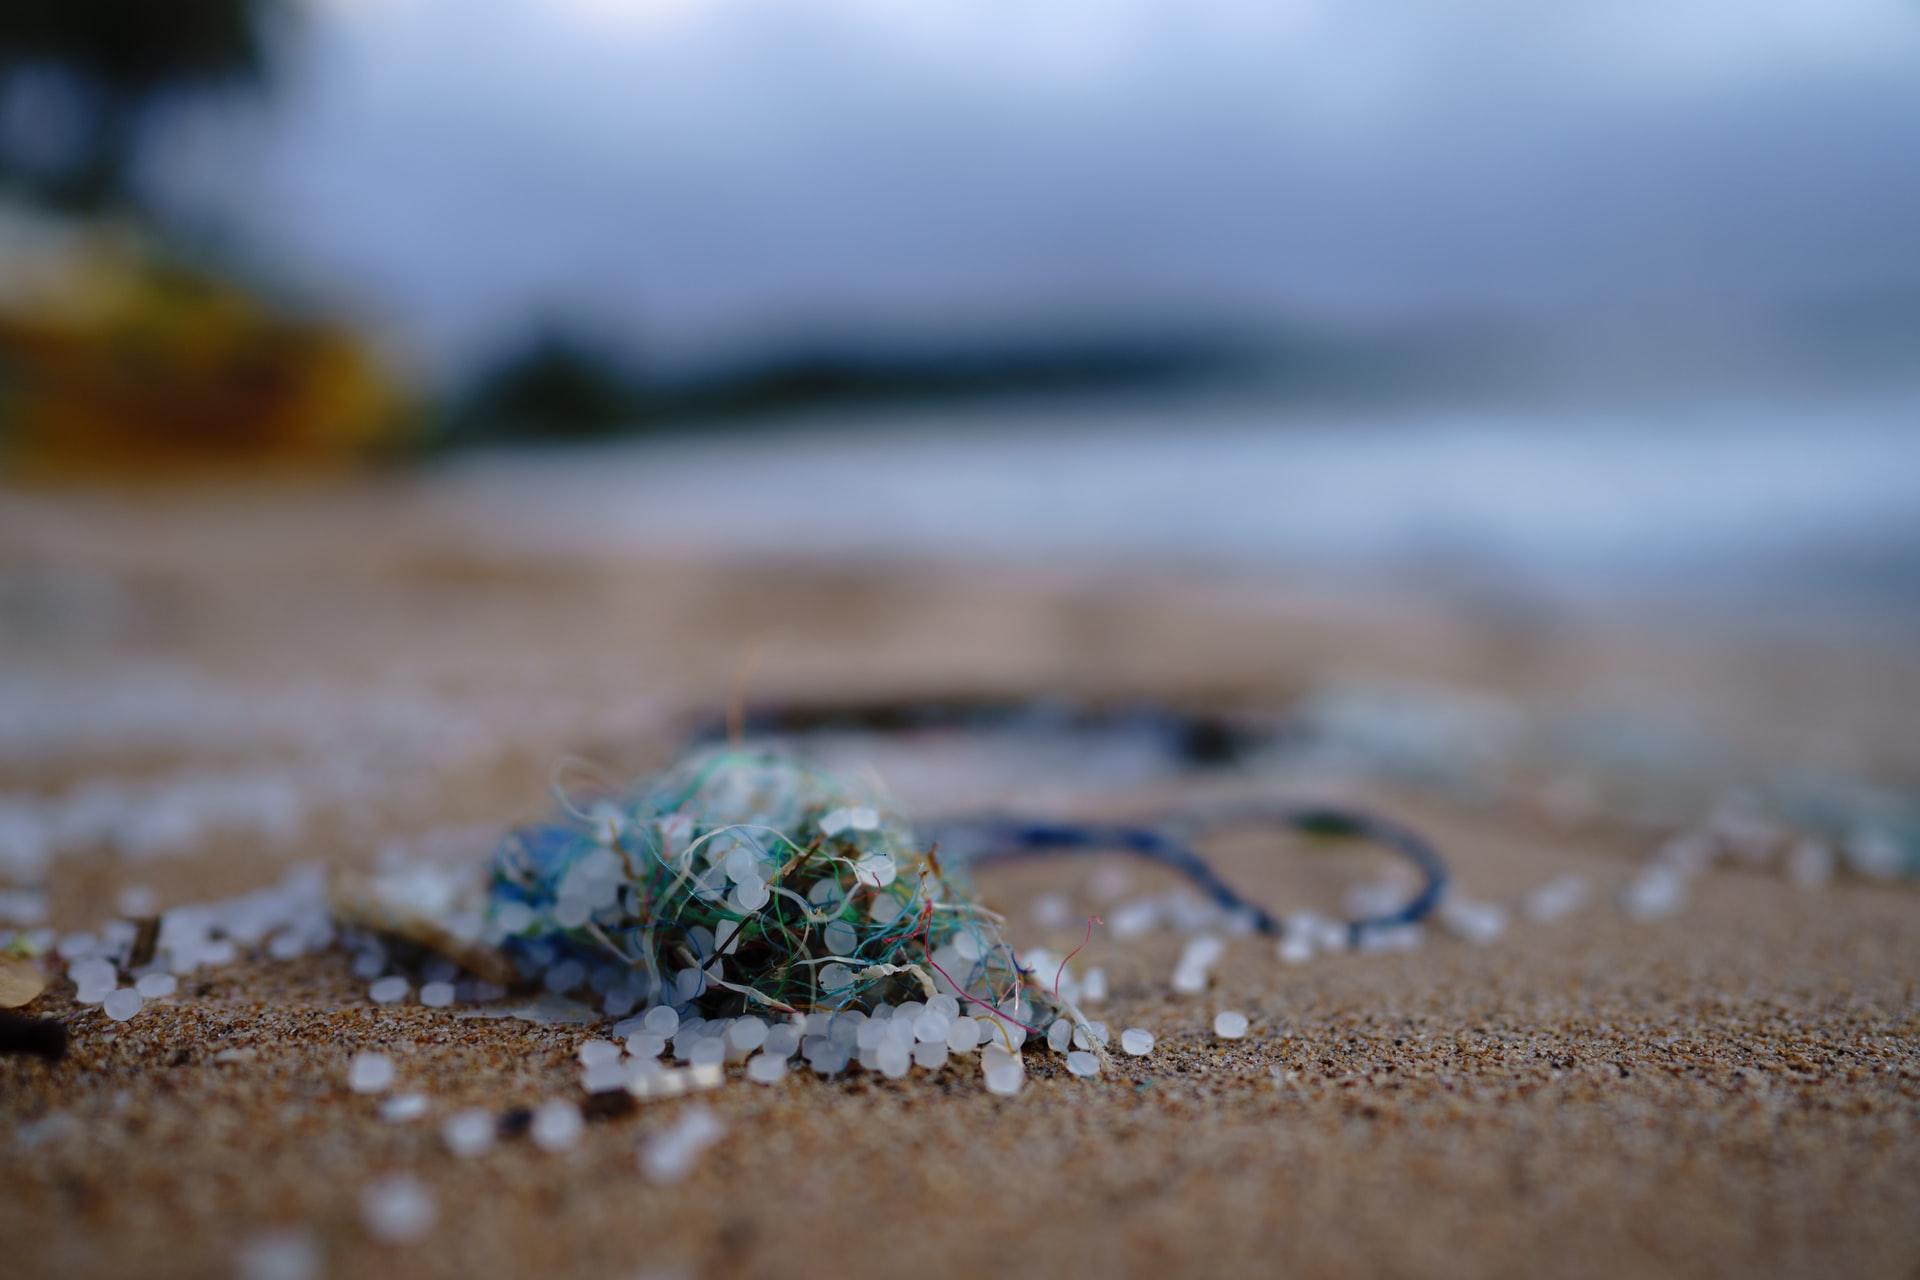 Plastic pellets found on the shore at Marissa, Sri Lanka, late May 2021